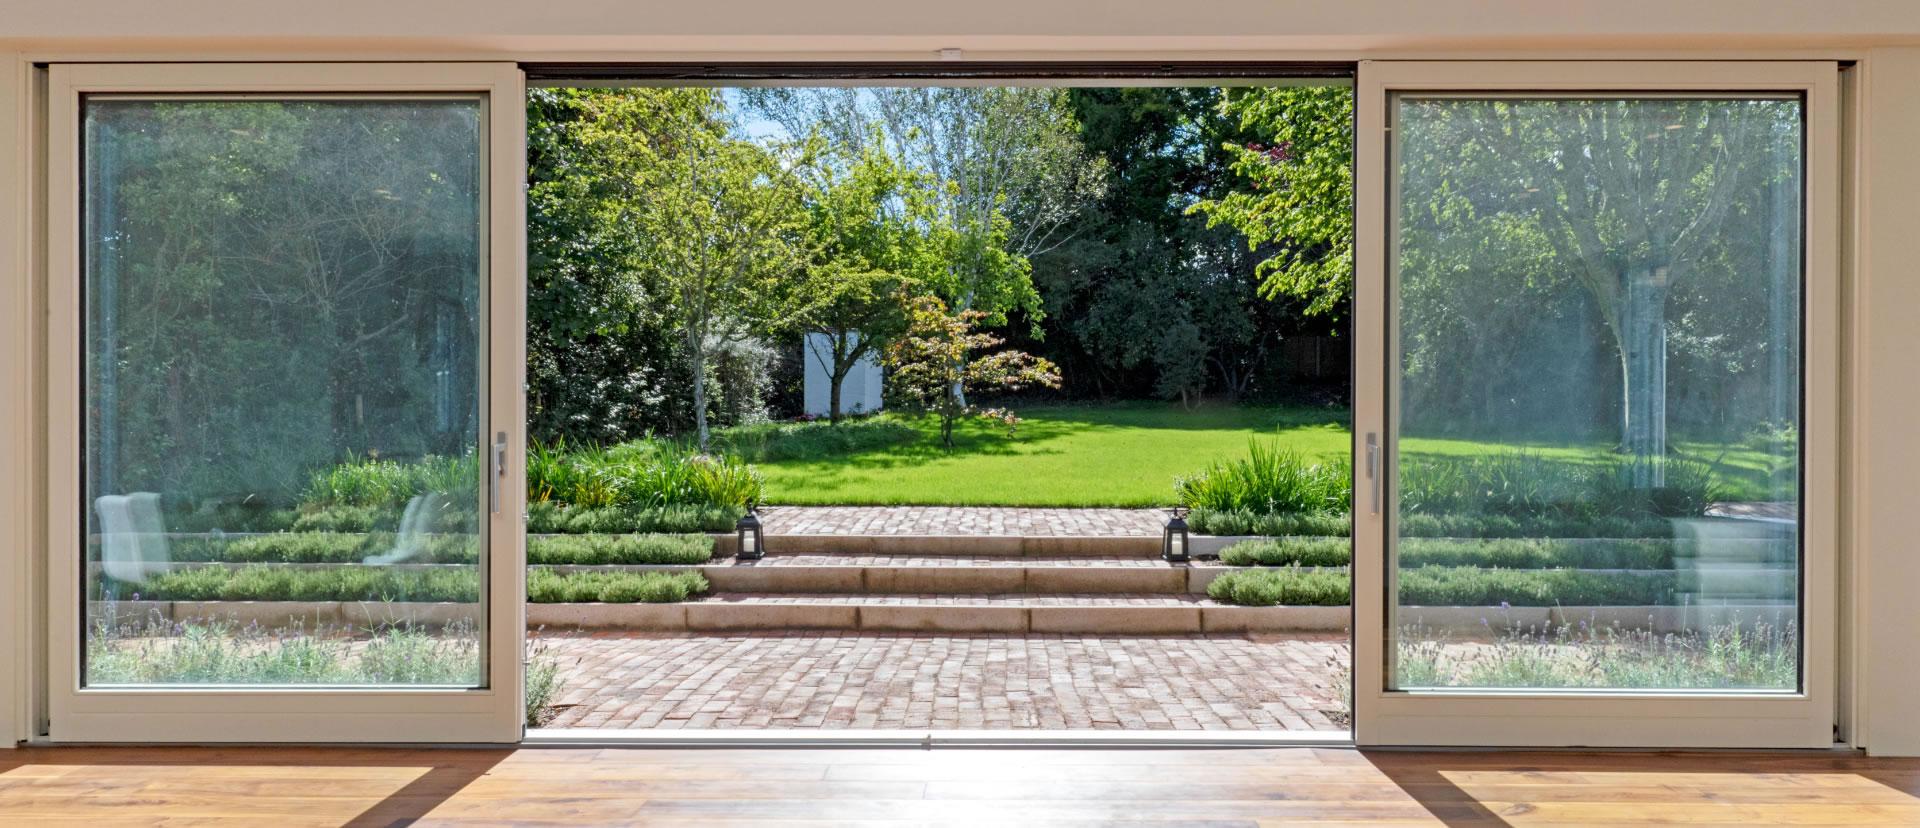 Bungalow Blitz | Full Architectural Services